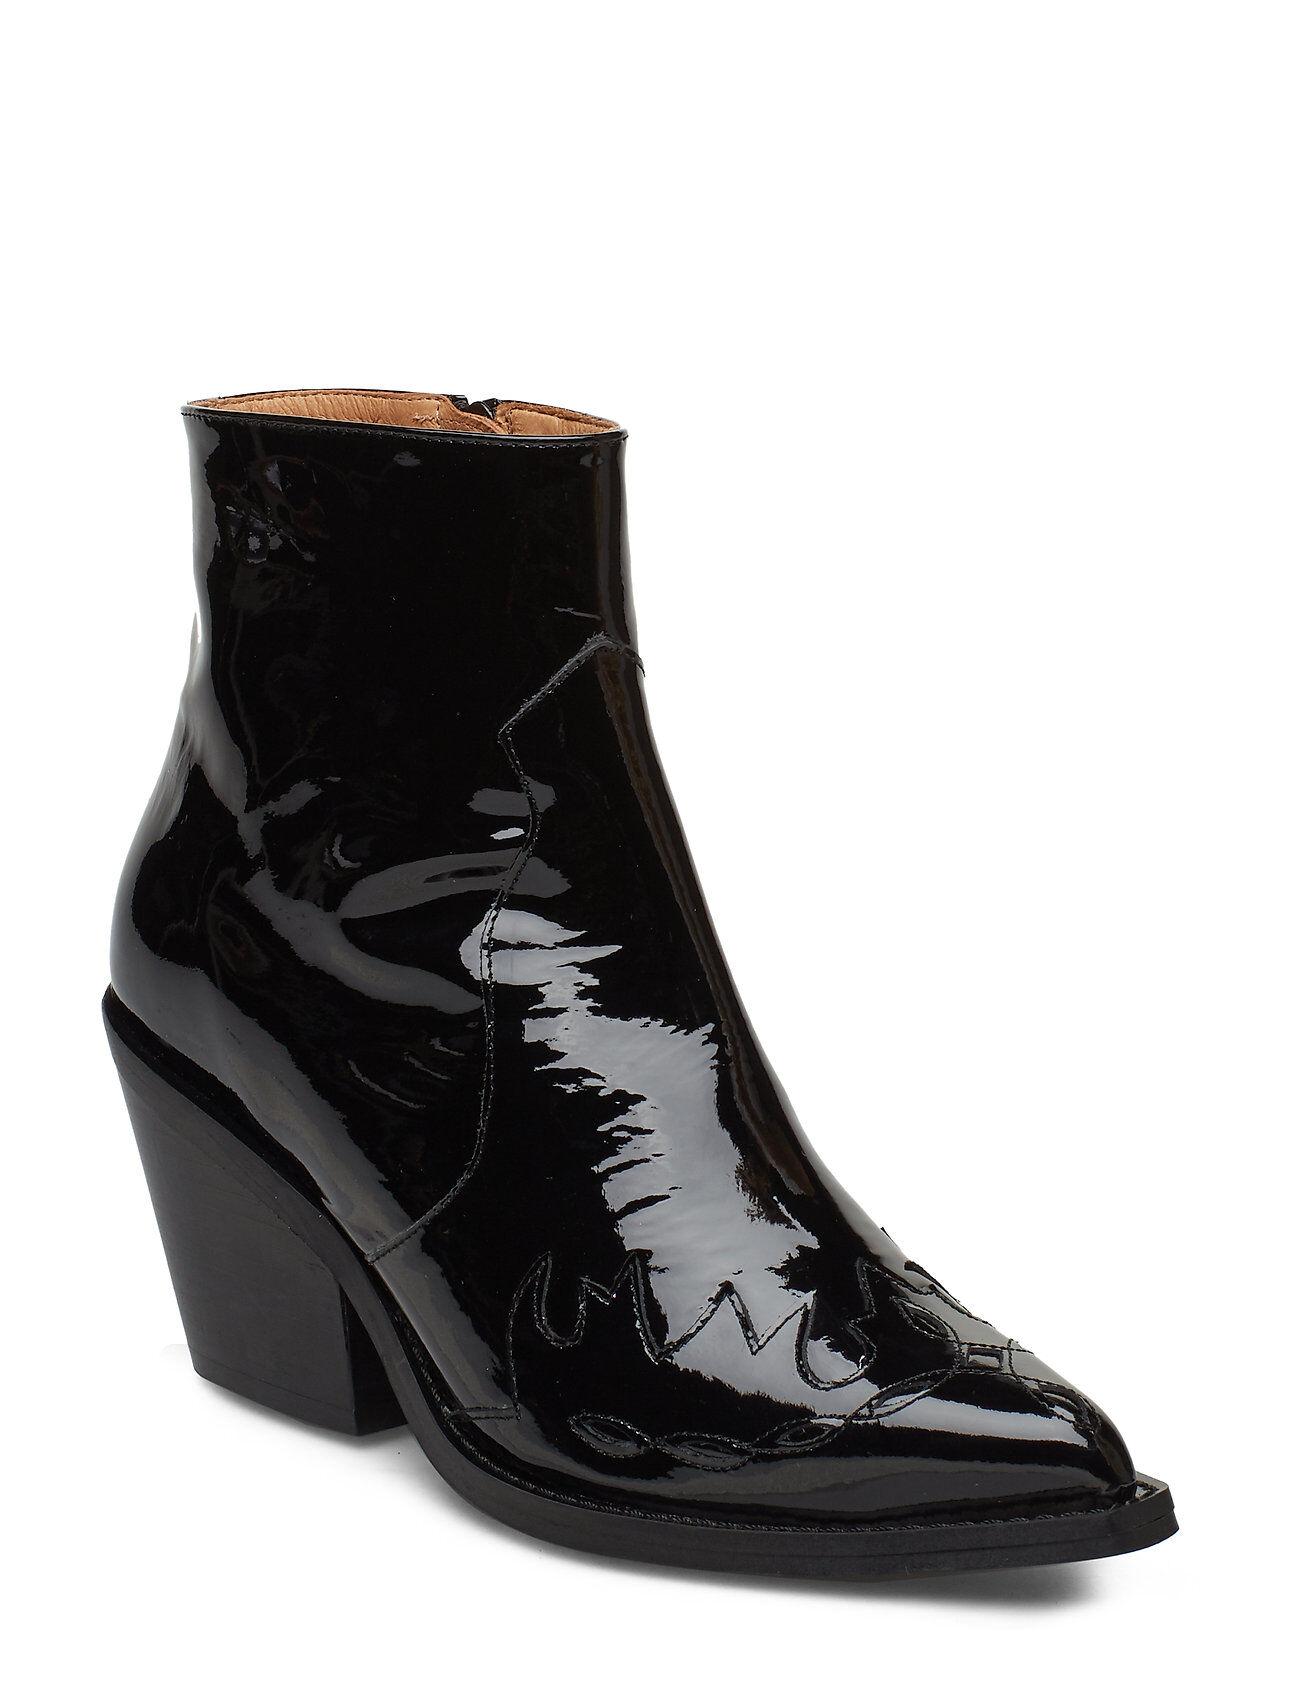 Henry Kole Lynn Patent Black Shoes Boots Ankle Boots Ankle Boots With Heel Musta Henry Kole